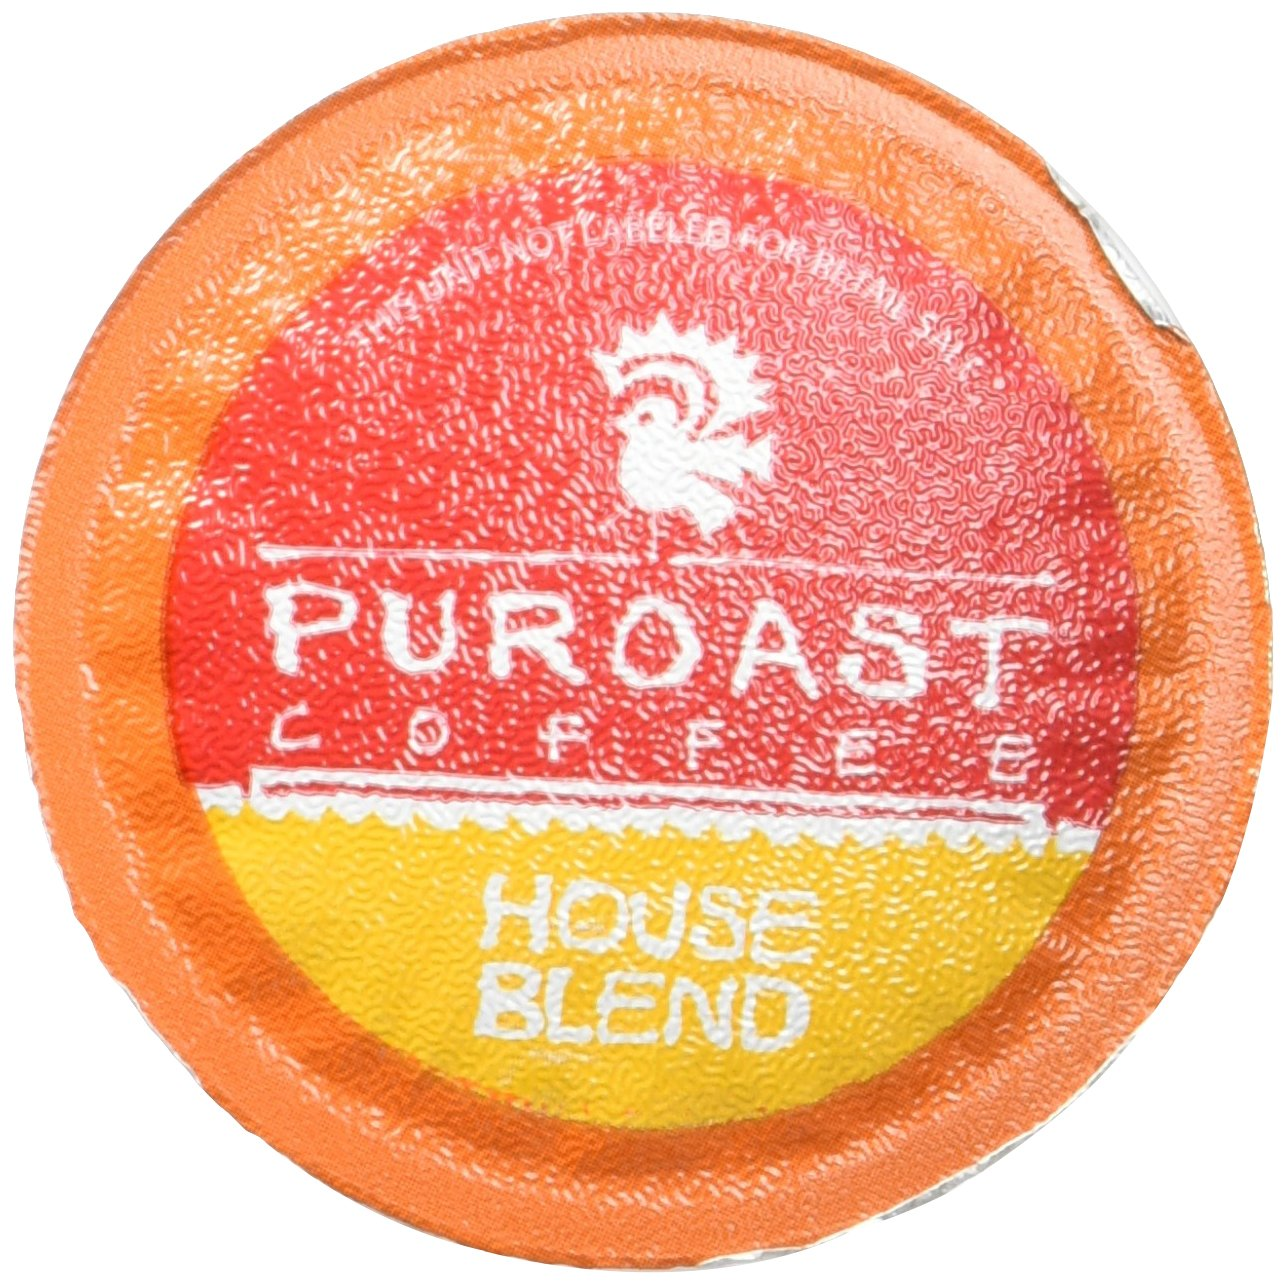 Puroast Low Acid Coffee House Blend Single Serve, 2.0 Keurig Compatible, 4.87 Ounce